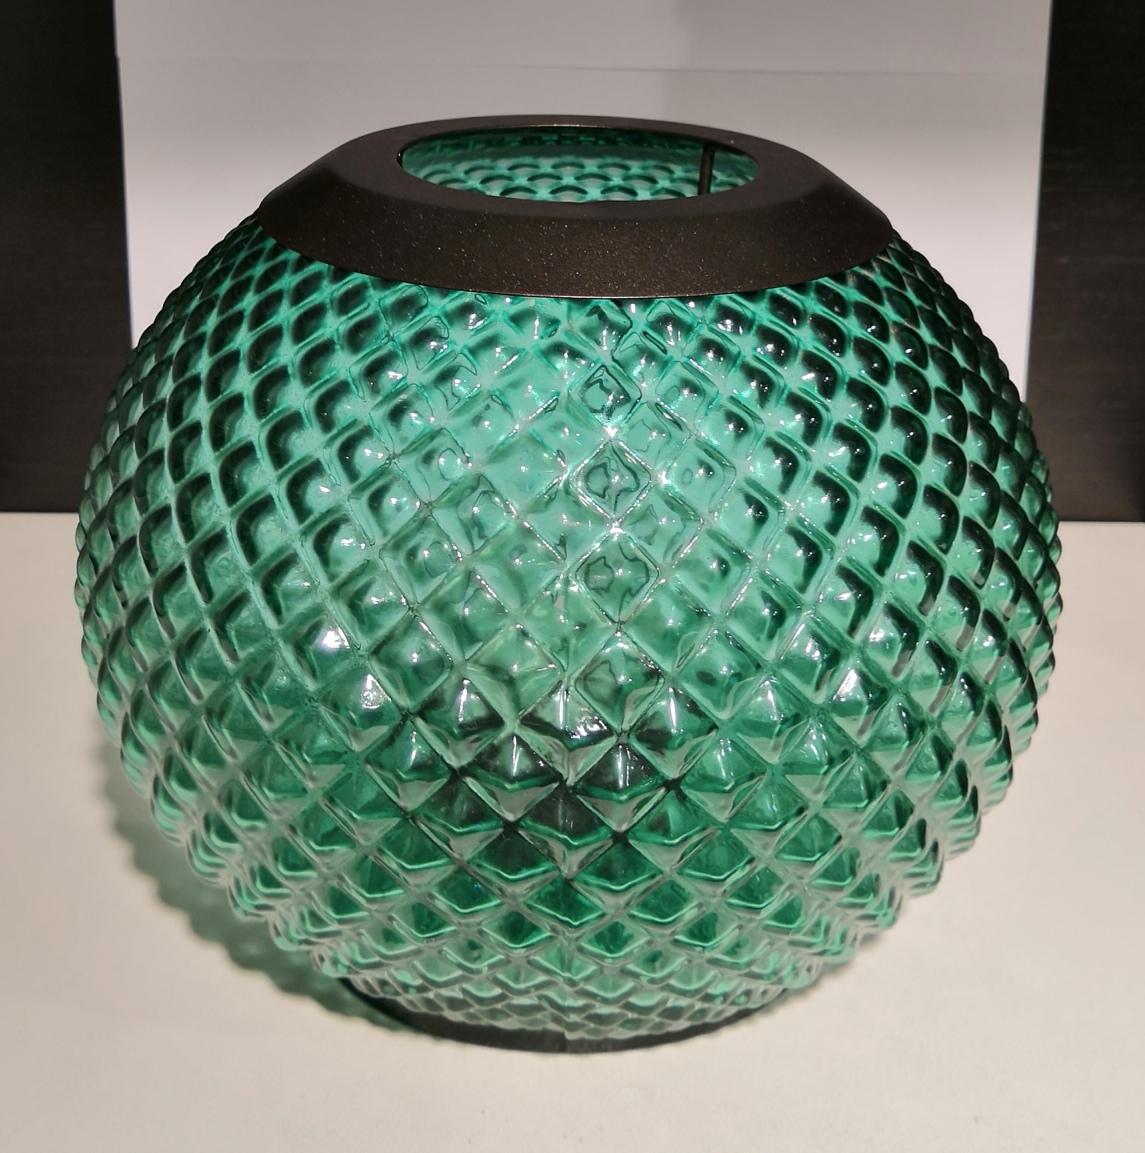 17.9x17.7x16.7 cm Arancione YANKEE CANDLE 1507914 Monterosso Votive Holder Lanterns Porta Sampler